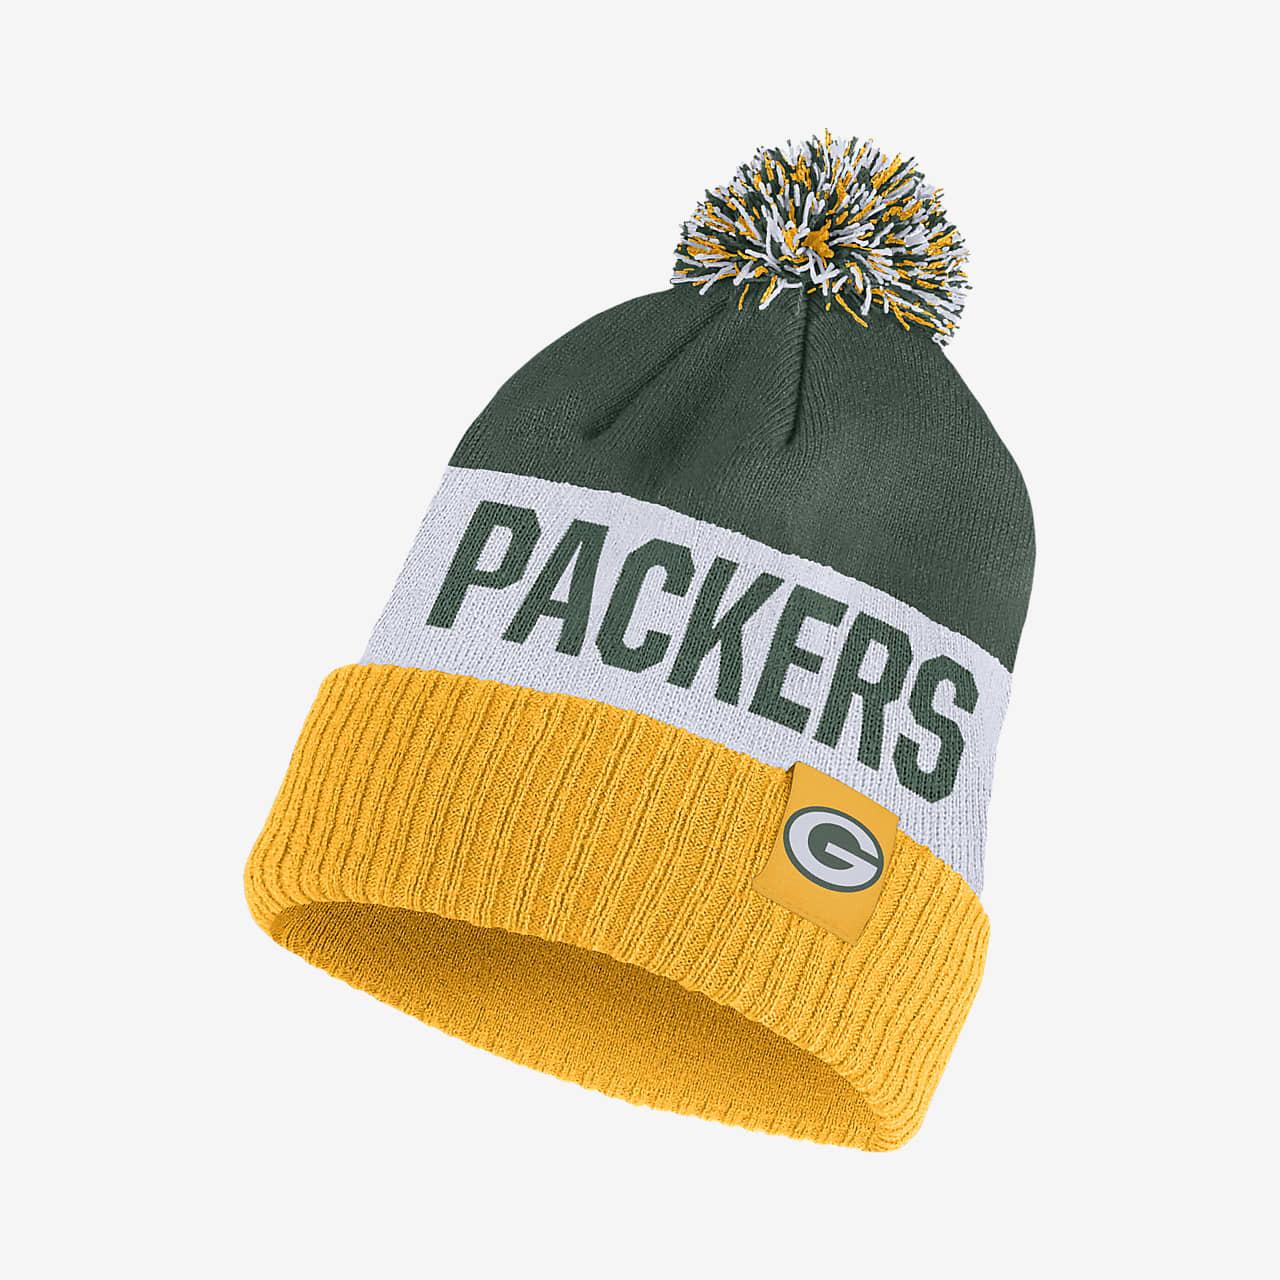 Bonnet Nike (NFL Packers)